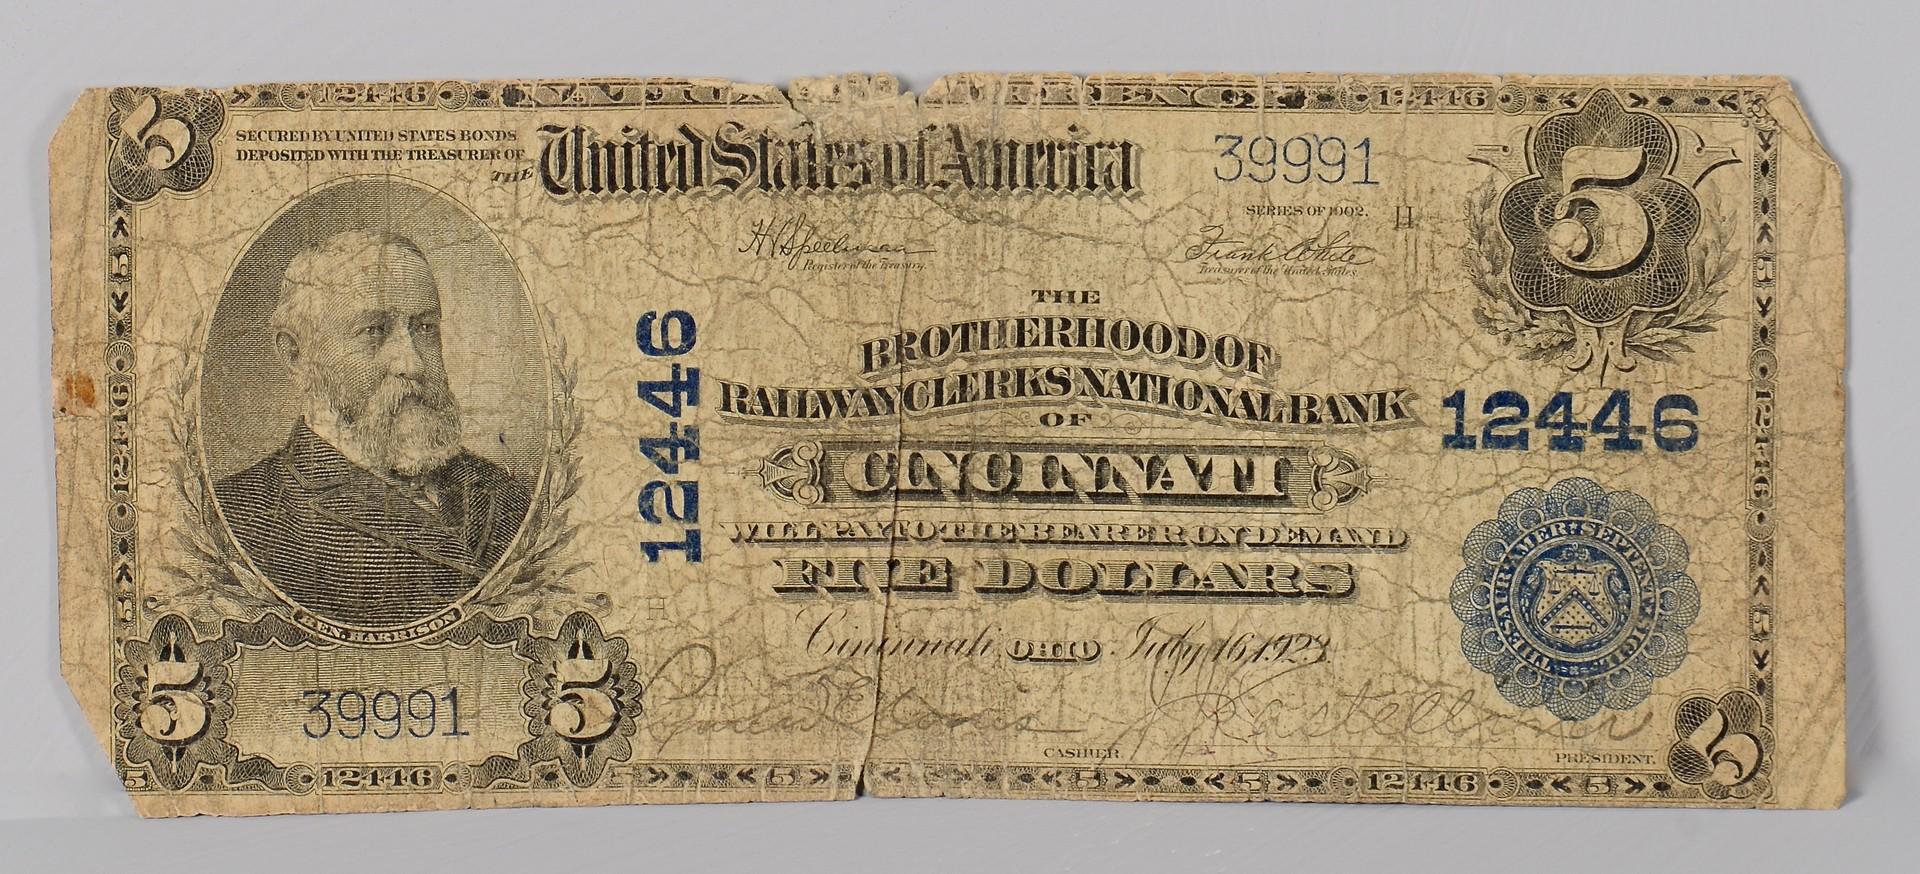 Lot 555: Civil War era Bond & Stock Certificate